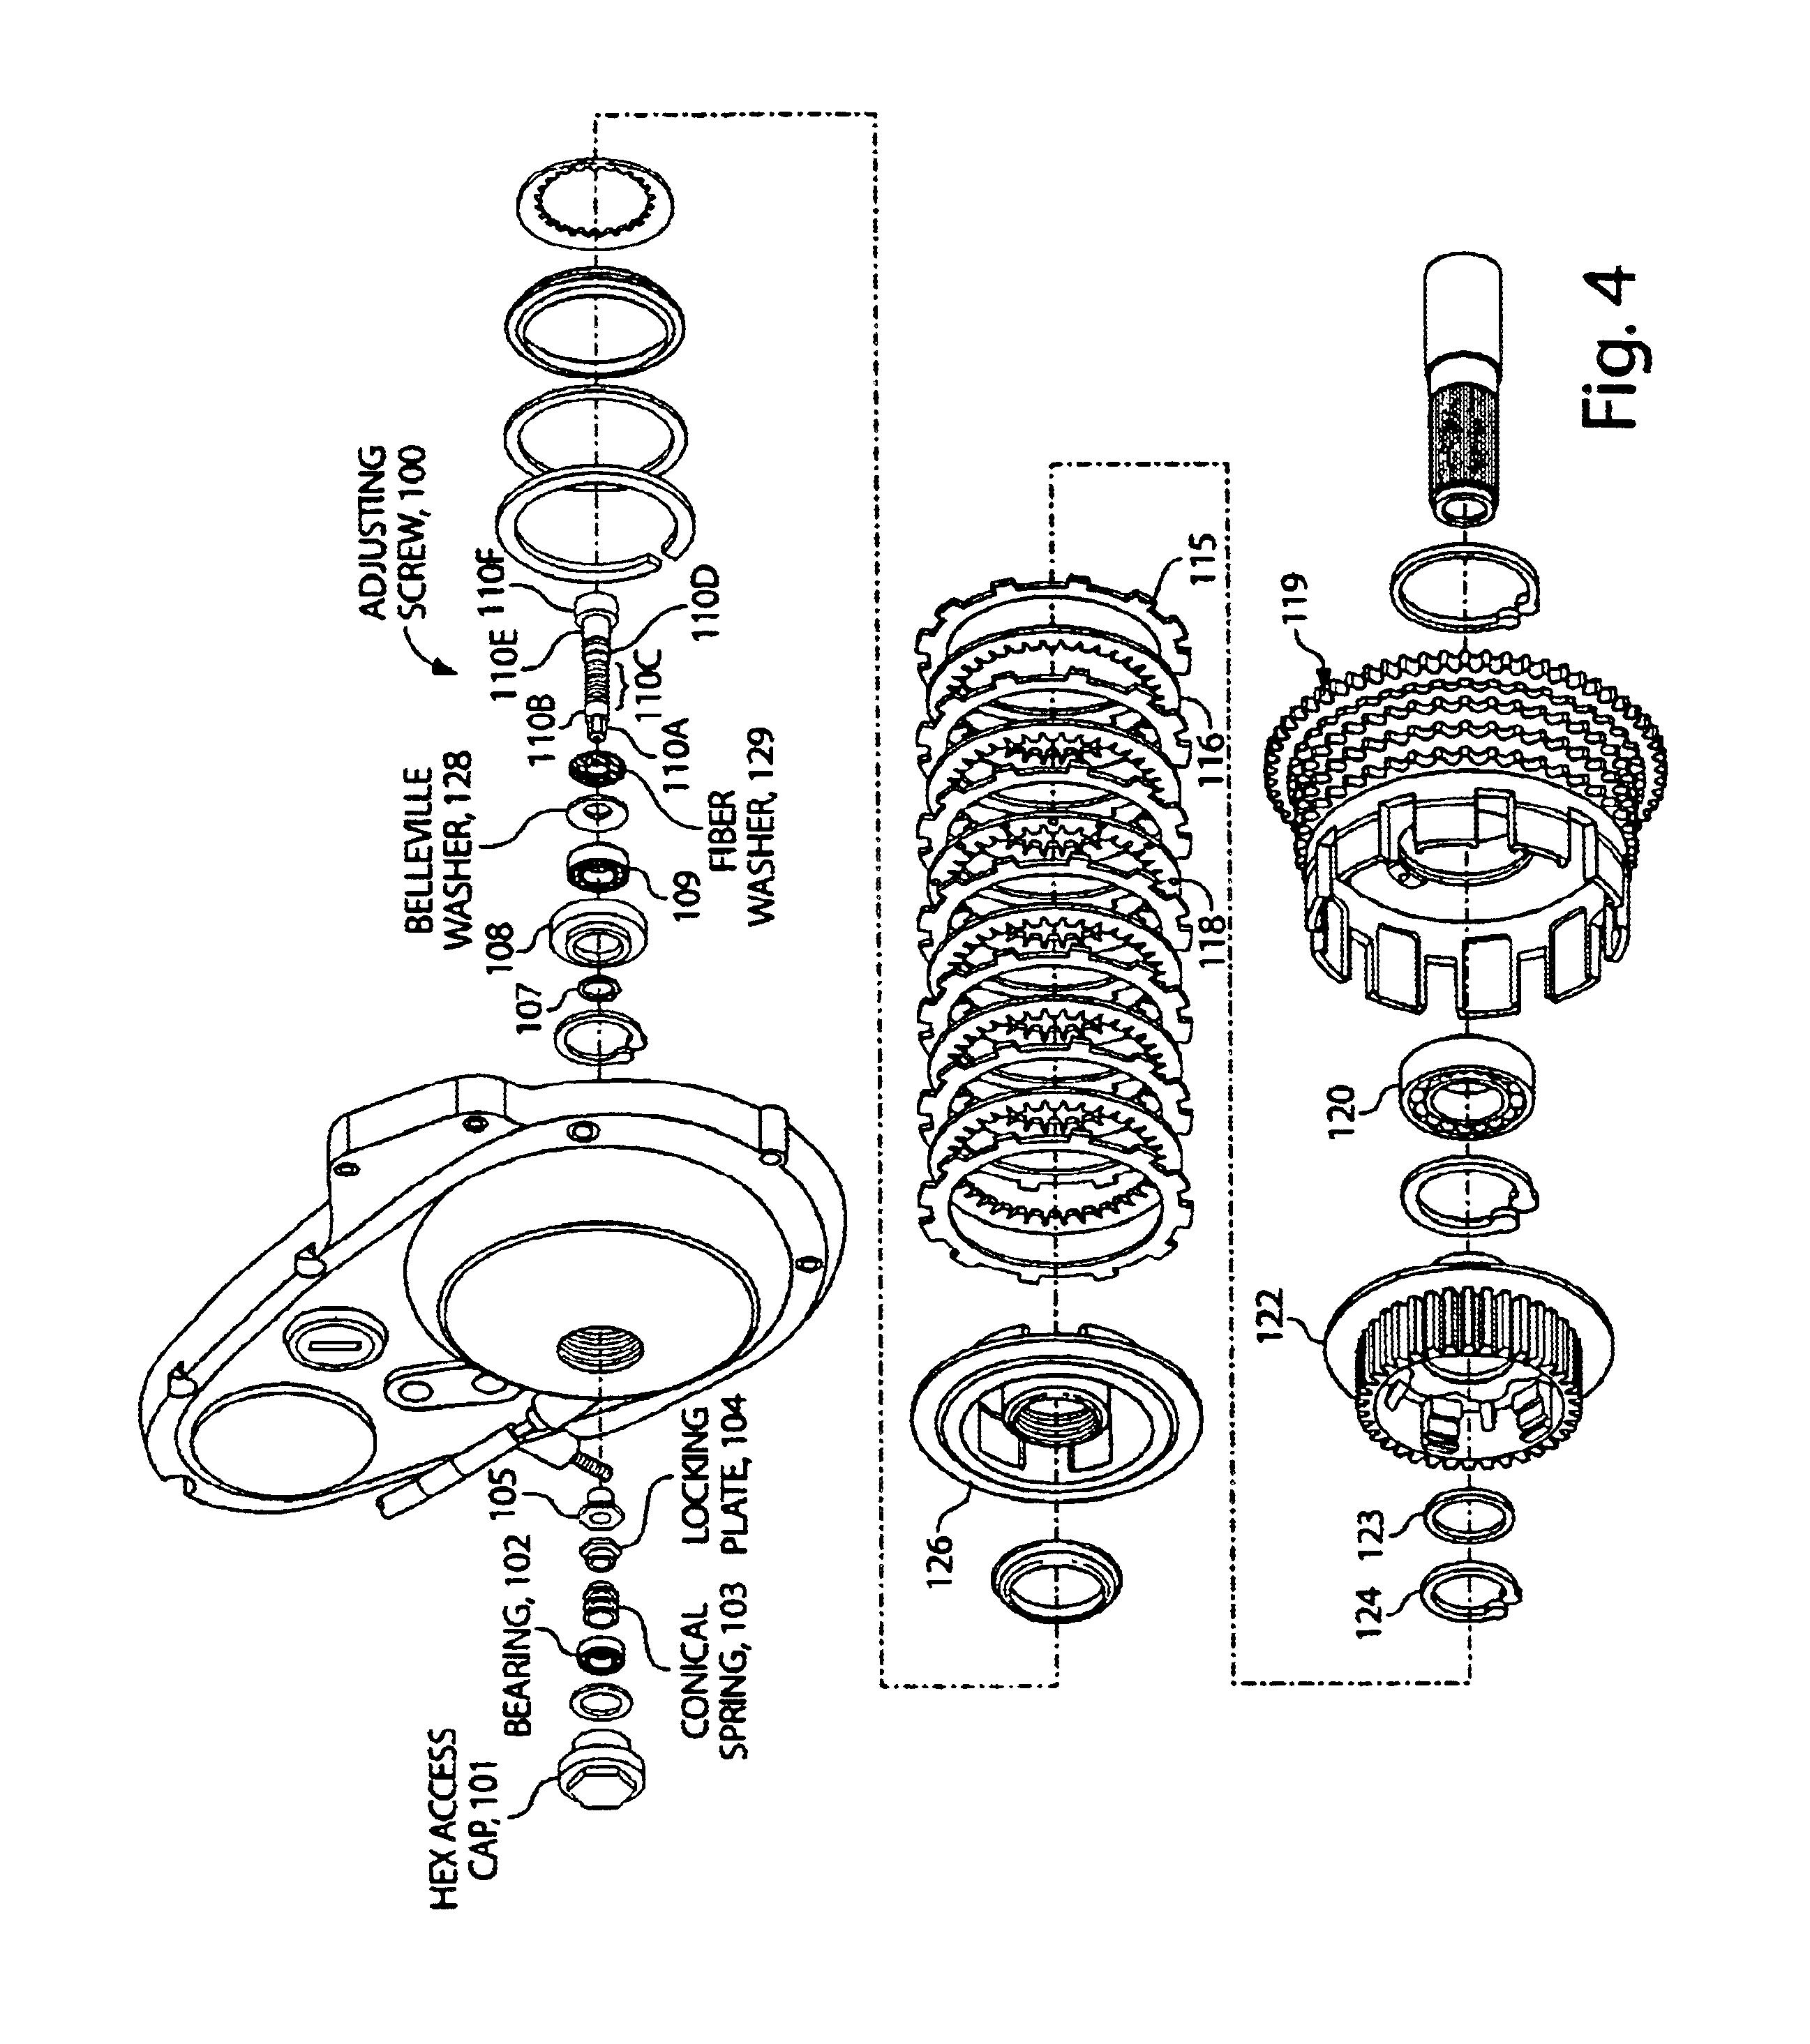 2008 harley davidson fuse box  diagrams  auto fuse box diagram